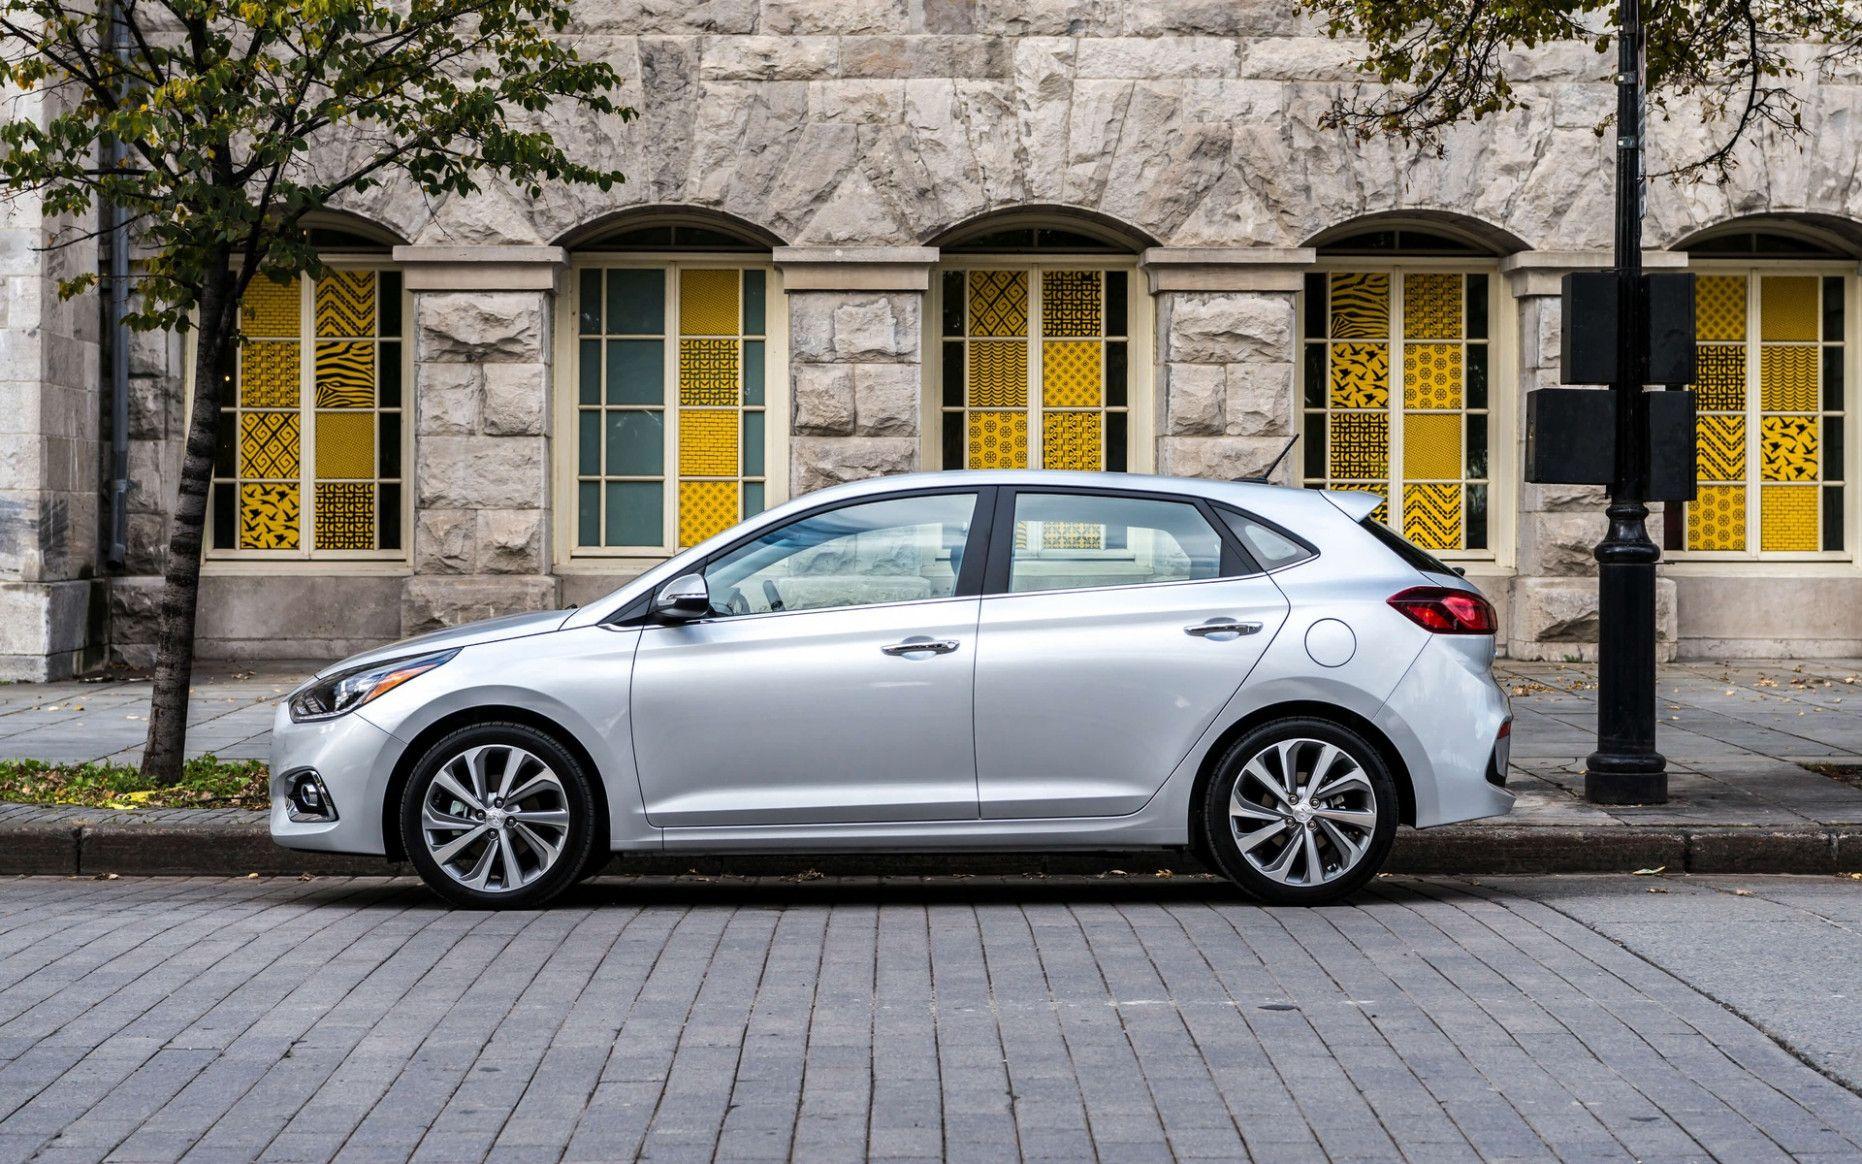 2020 Hyundai Accent Hatchback Model In 2020 Hyundai Accent Accent Hatchback Hatchback